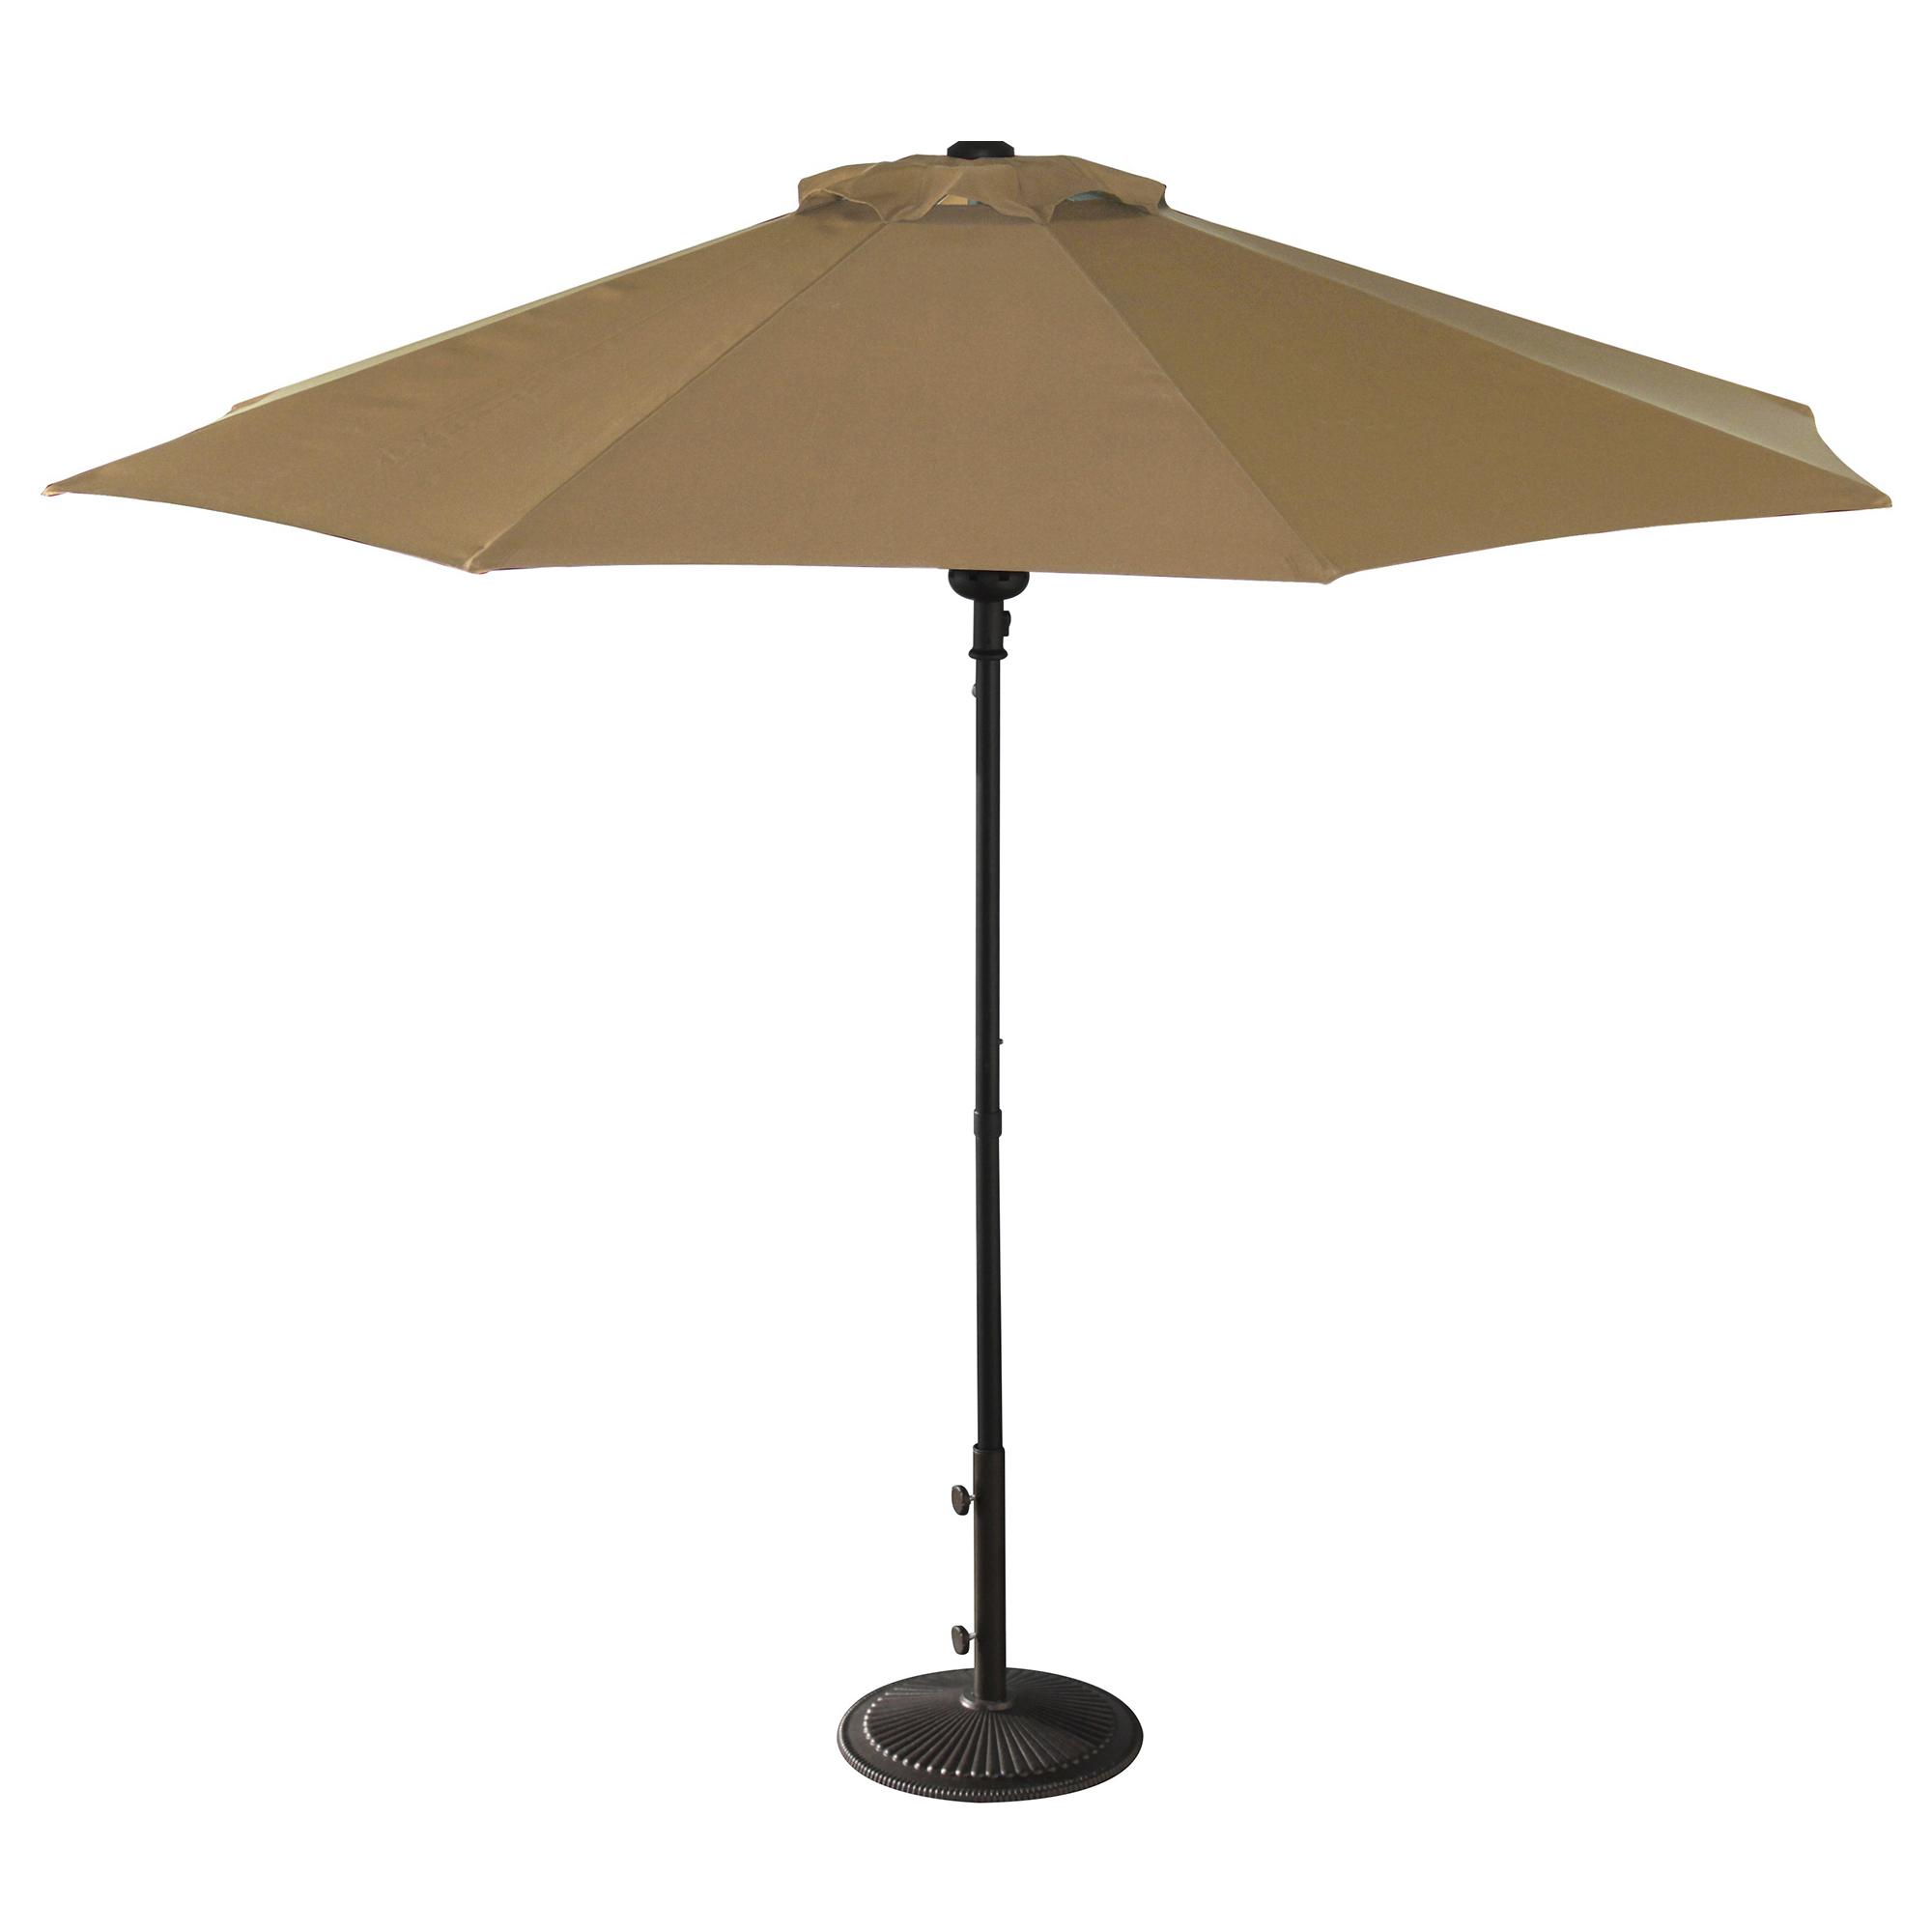 Patio Umbrella Alternative: Island Umbrella Cabo Auto-Open 9-ft Octagonal Market